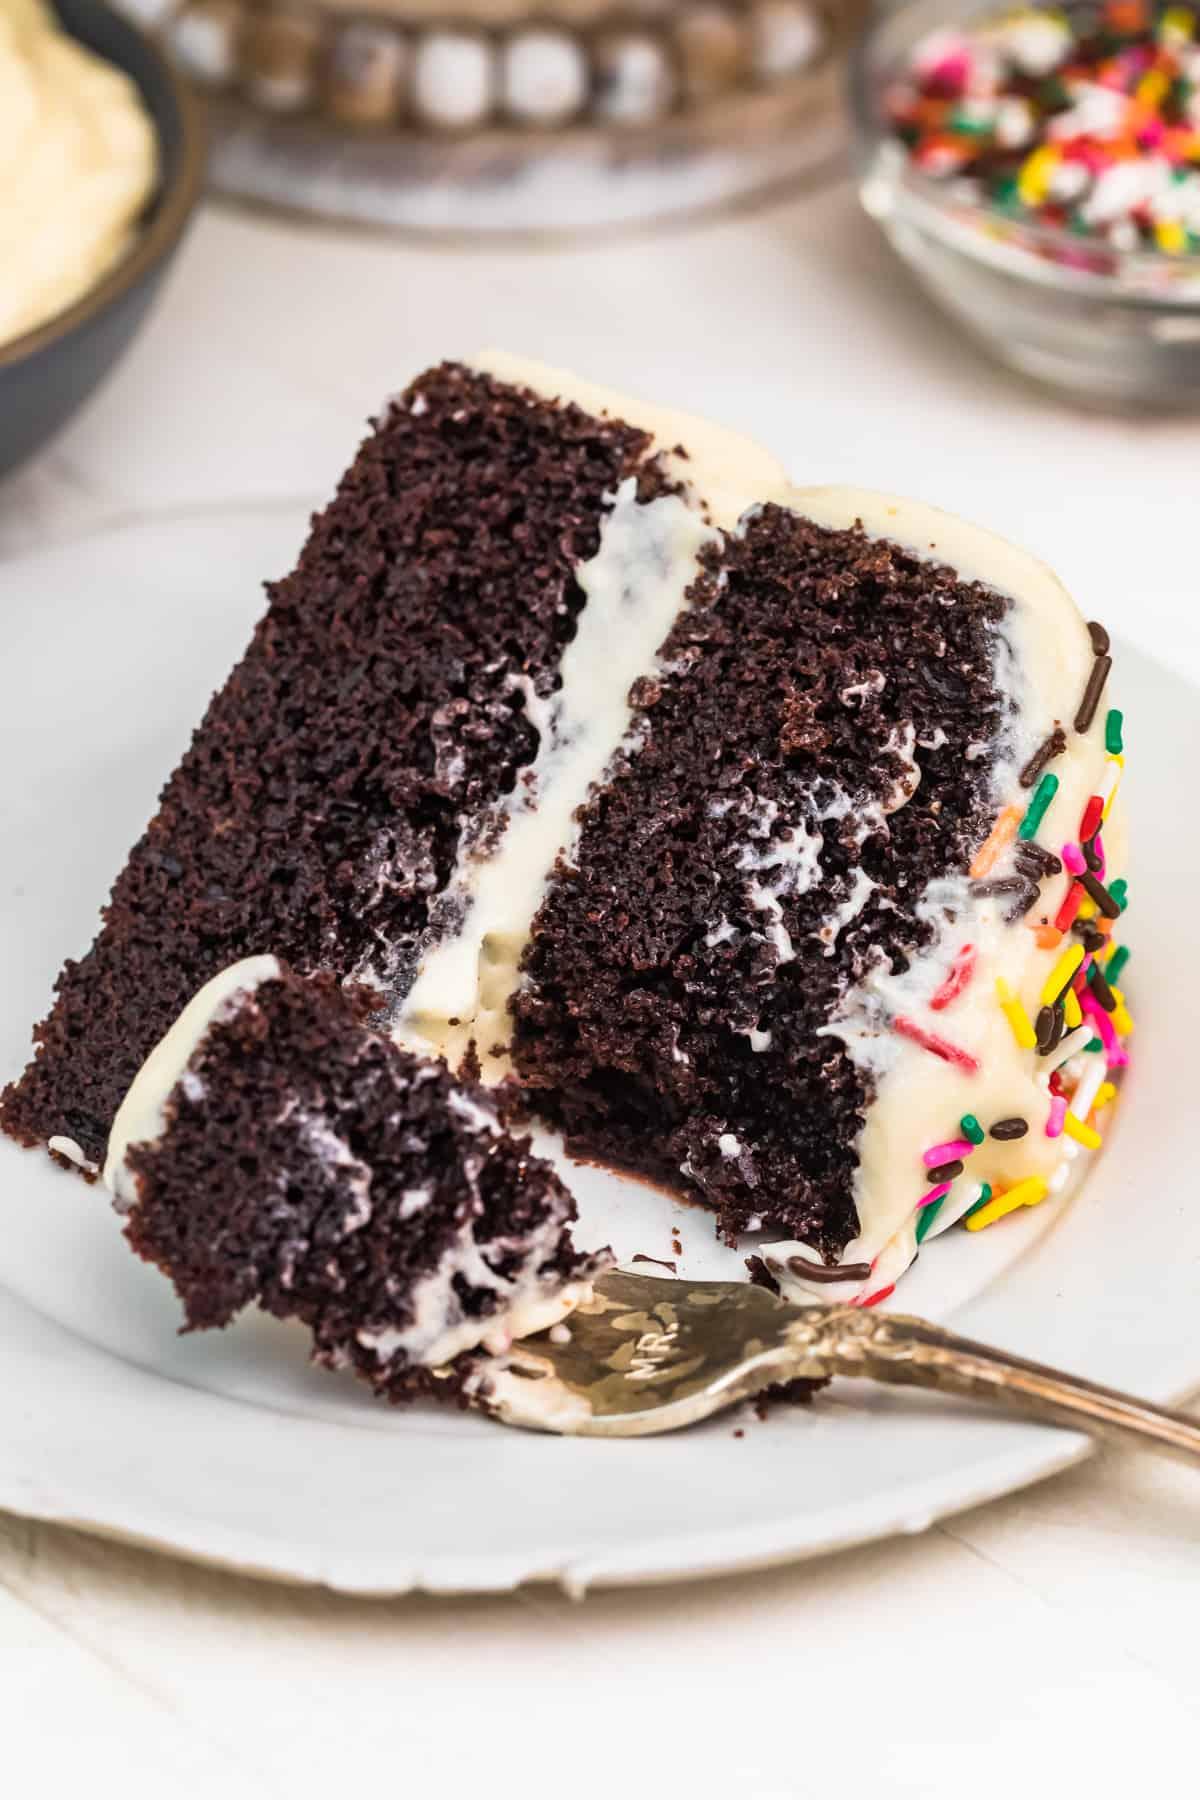 slice of black magic chocolate cake on plate